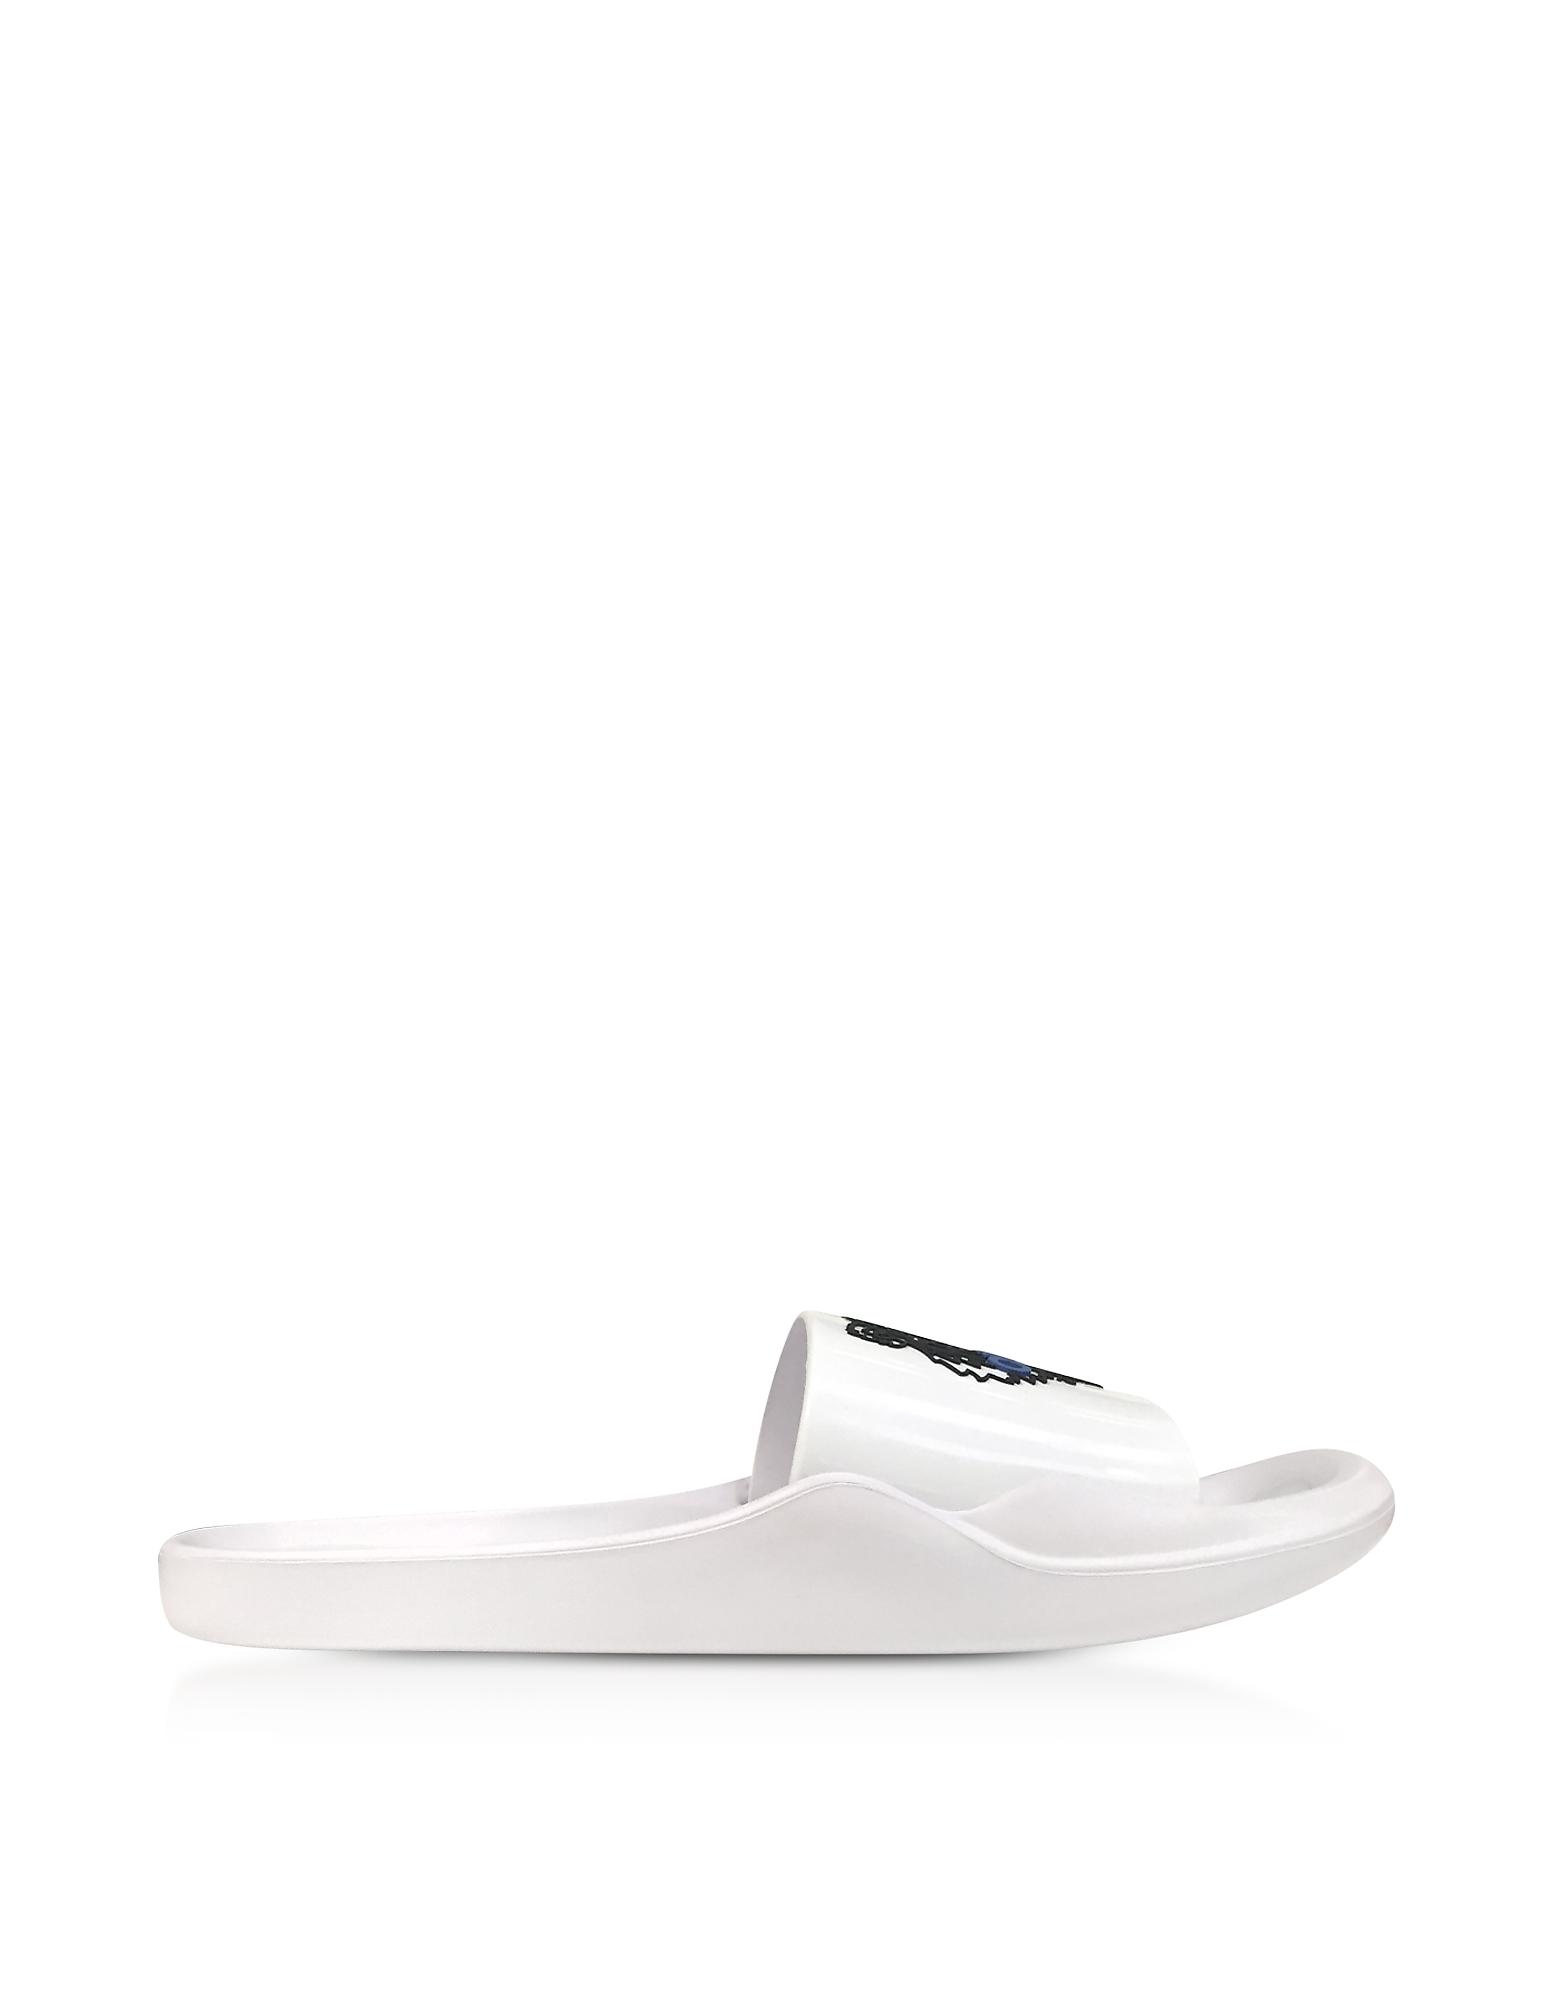 Kenzo Shoes, White Men's Pool Sandals w/Tiger Logo